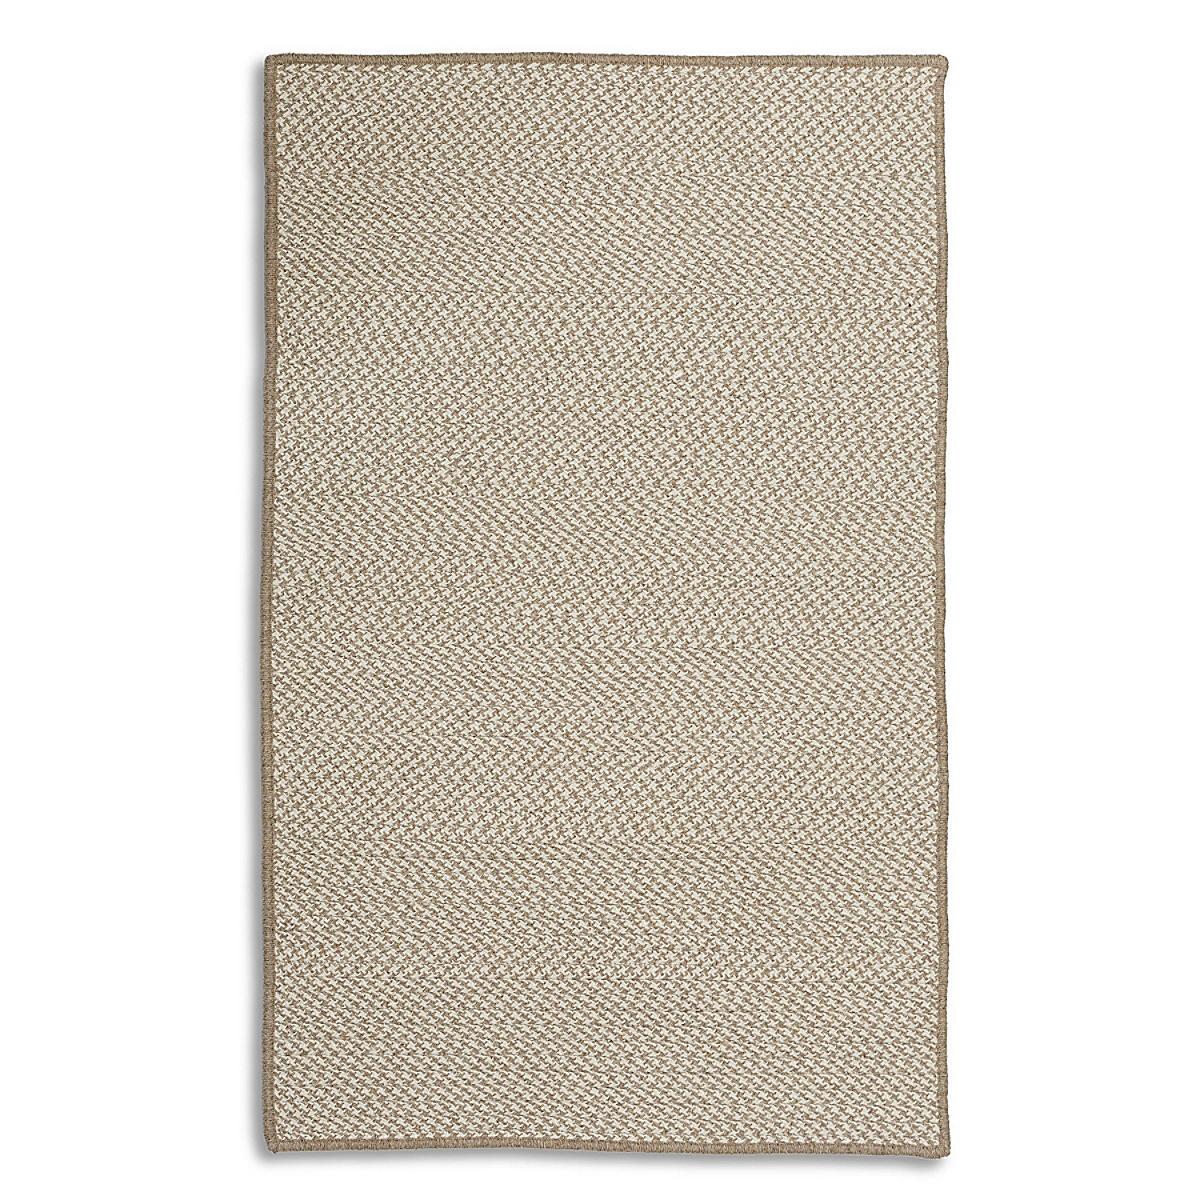 Houndstooth Wool Rug - Ivory